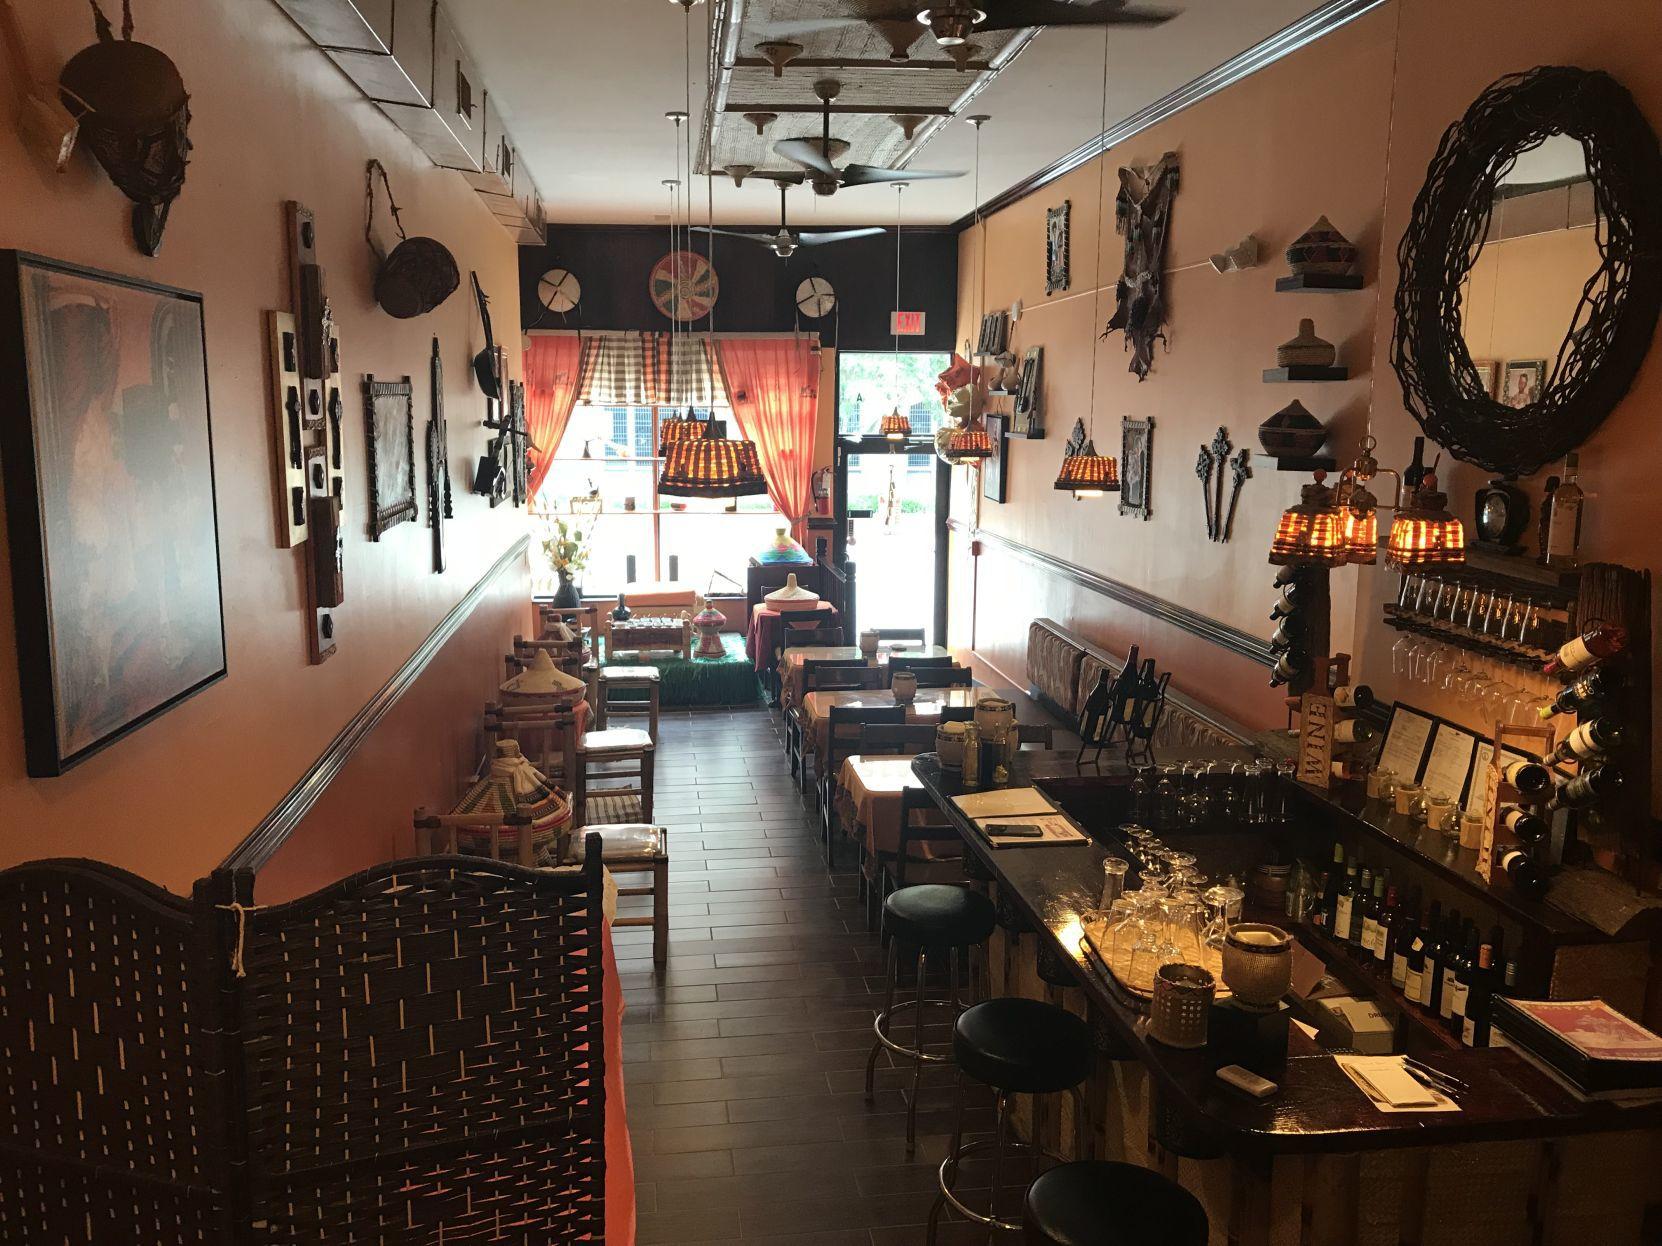 Kuru Ethiopian Restaurant On Grace Street Is Closed Caribbean Restaurant Opening In Its Place Restaurant News Richmond Com